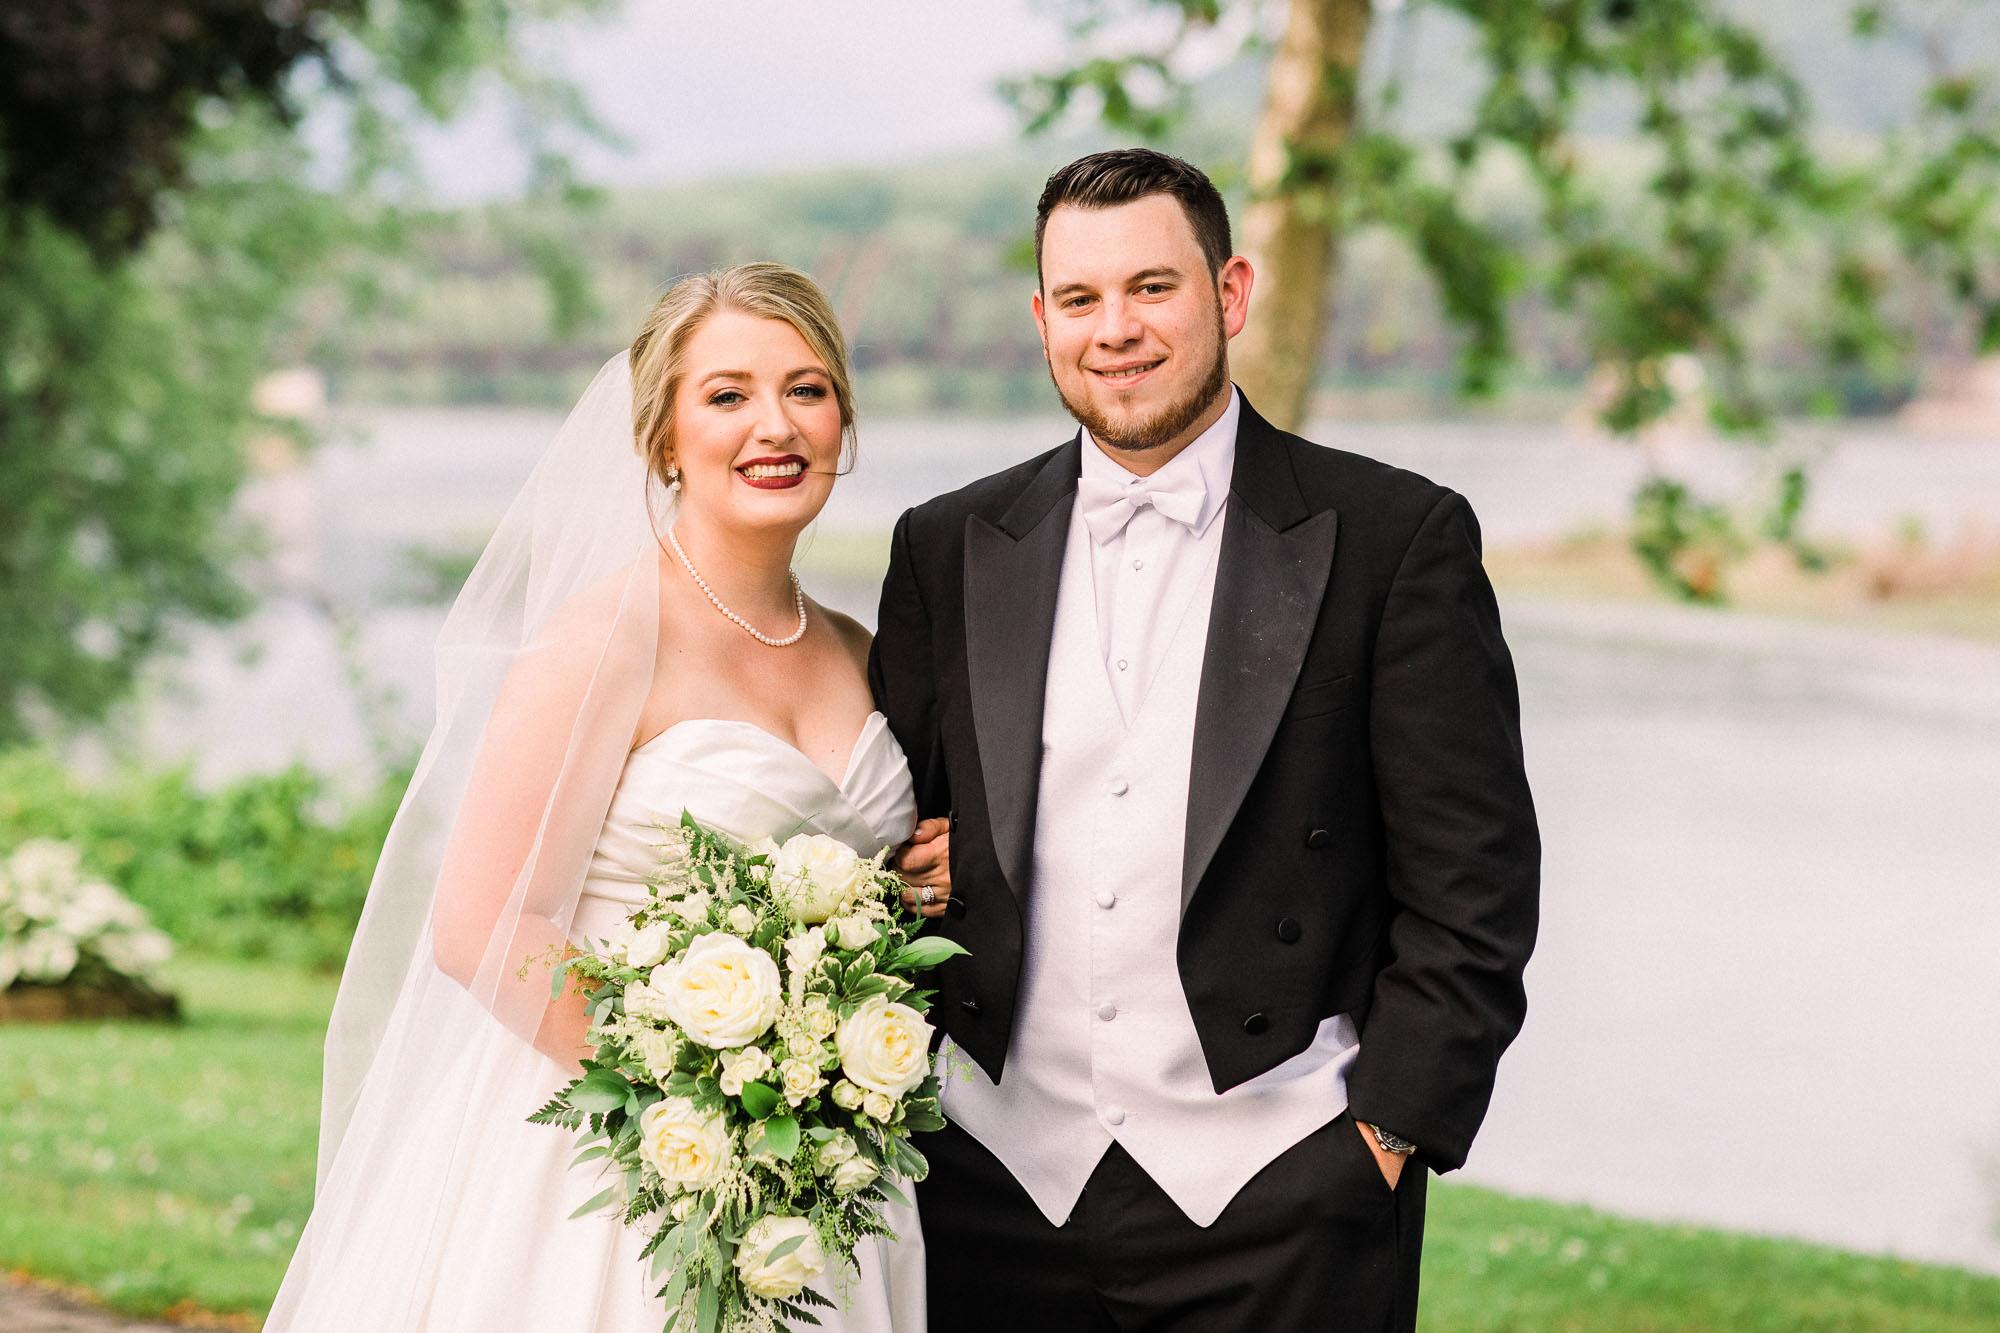 isle-of-que-wedding-4075.jpg